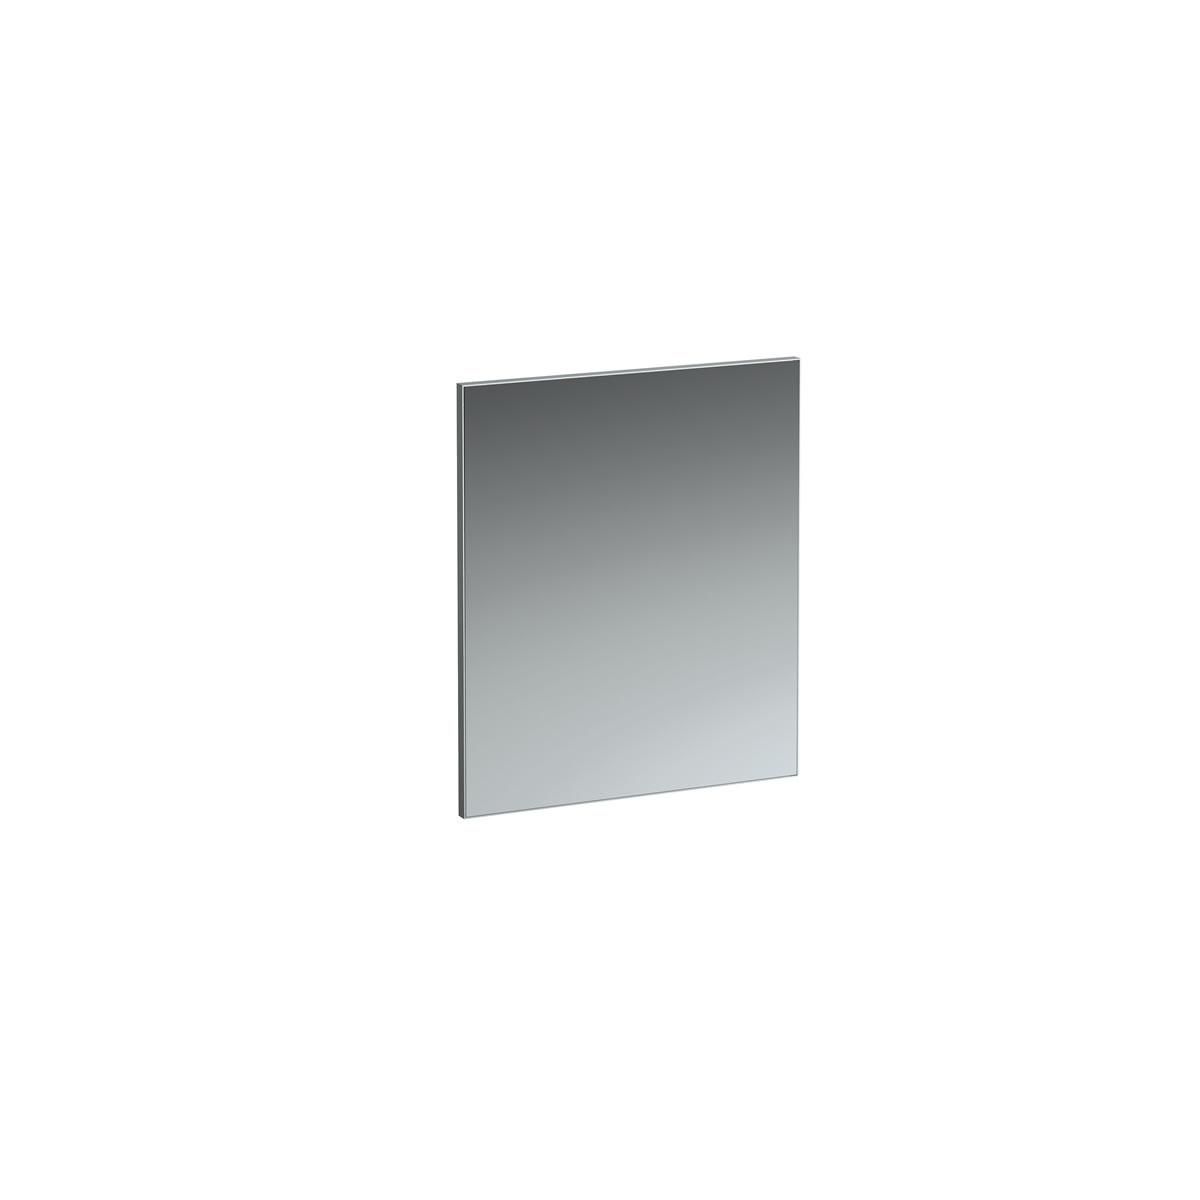 Frame 25 - zrcadlo 60x70, bez osvětlení